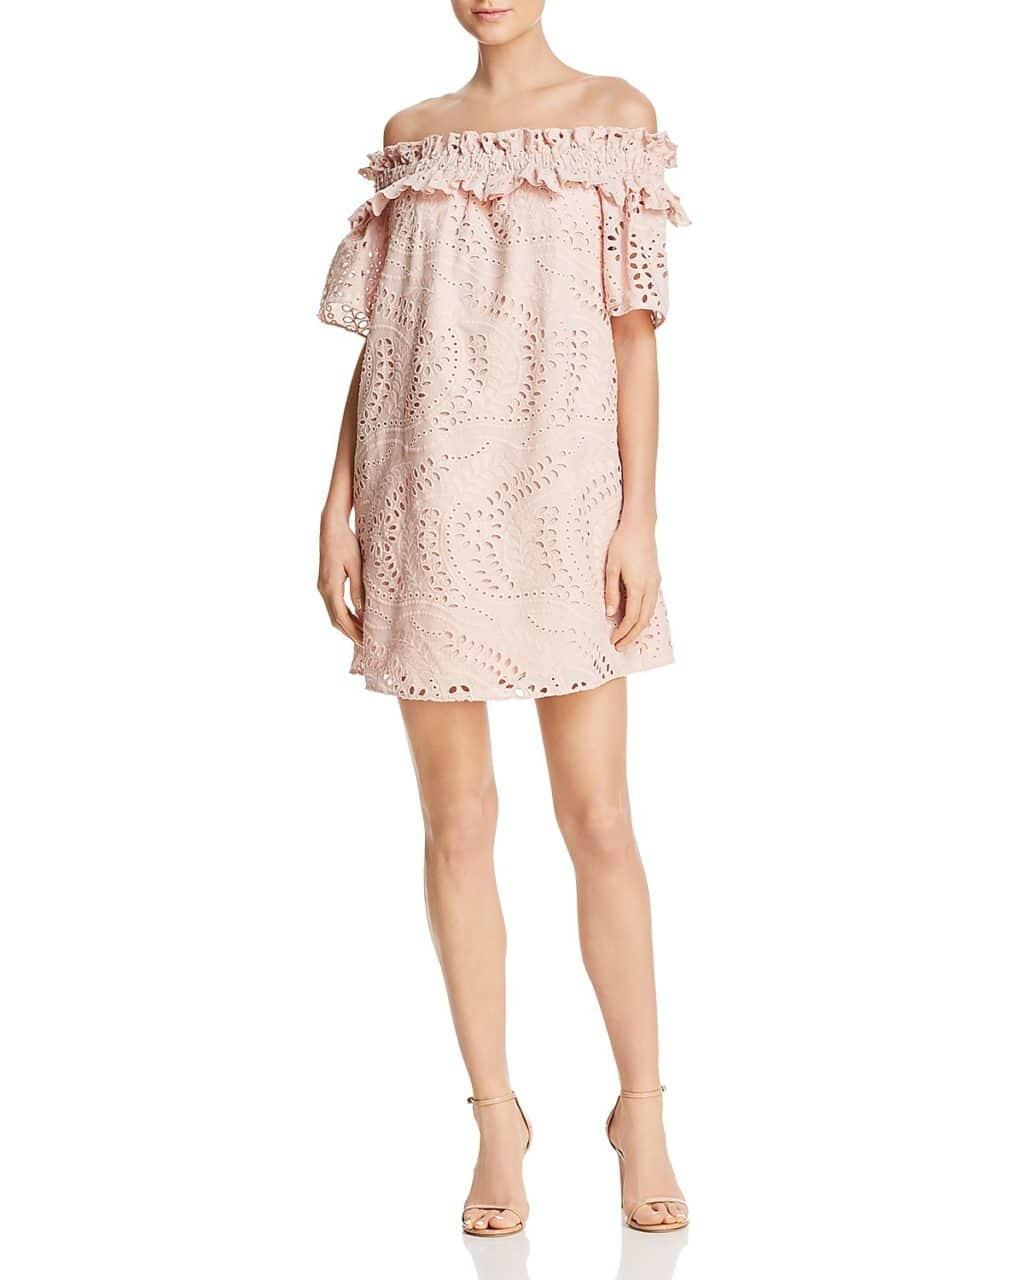 PARKER Cable Off-the-Shoulder Eyelet Pearl Blush Dress